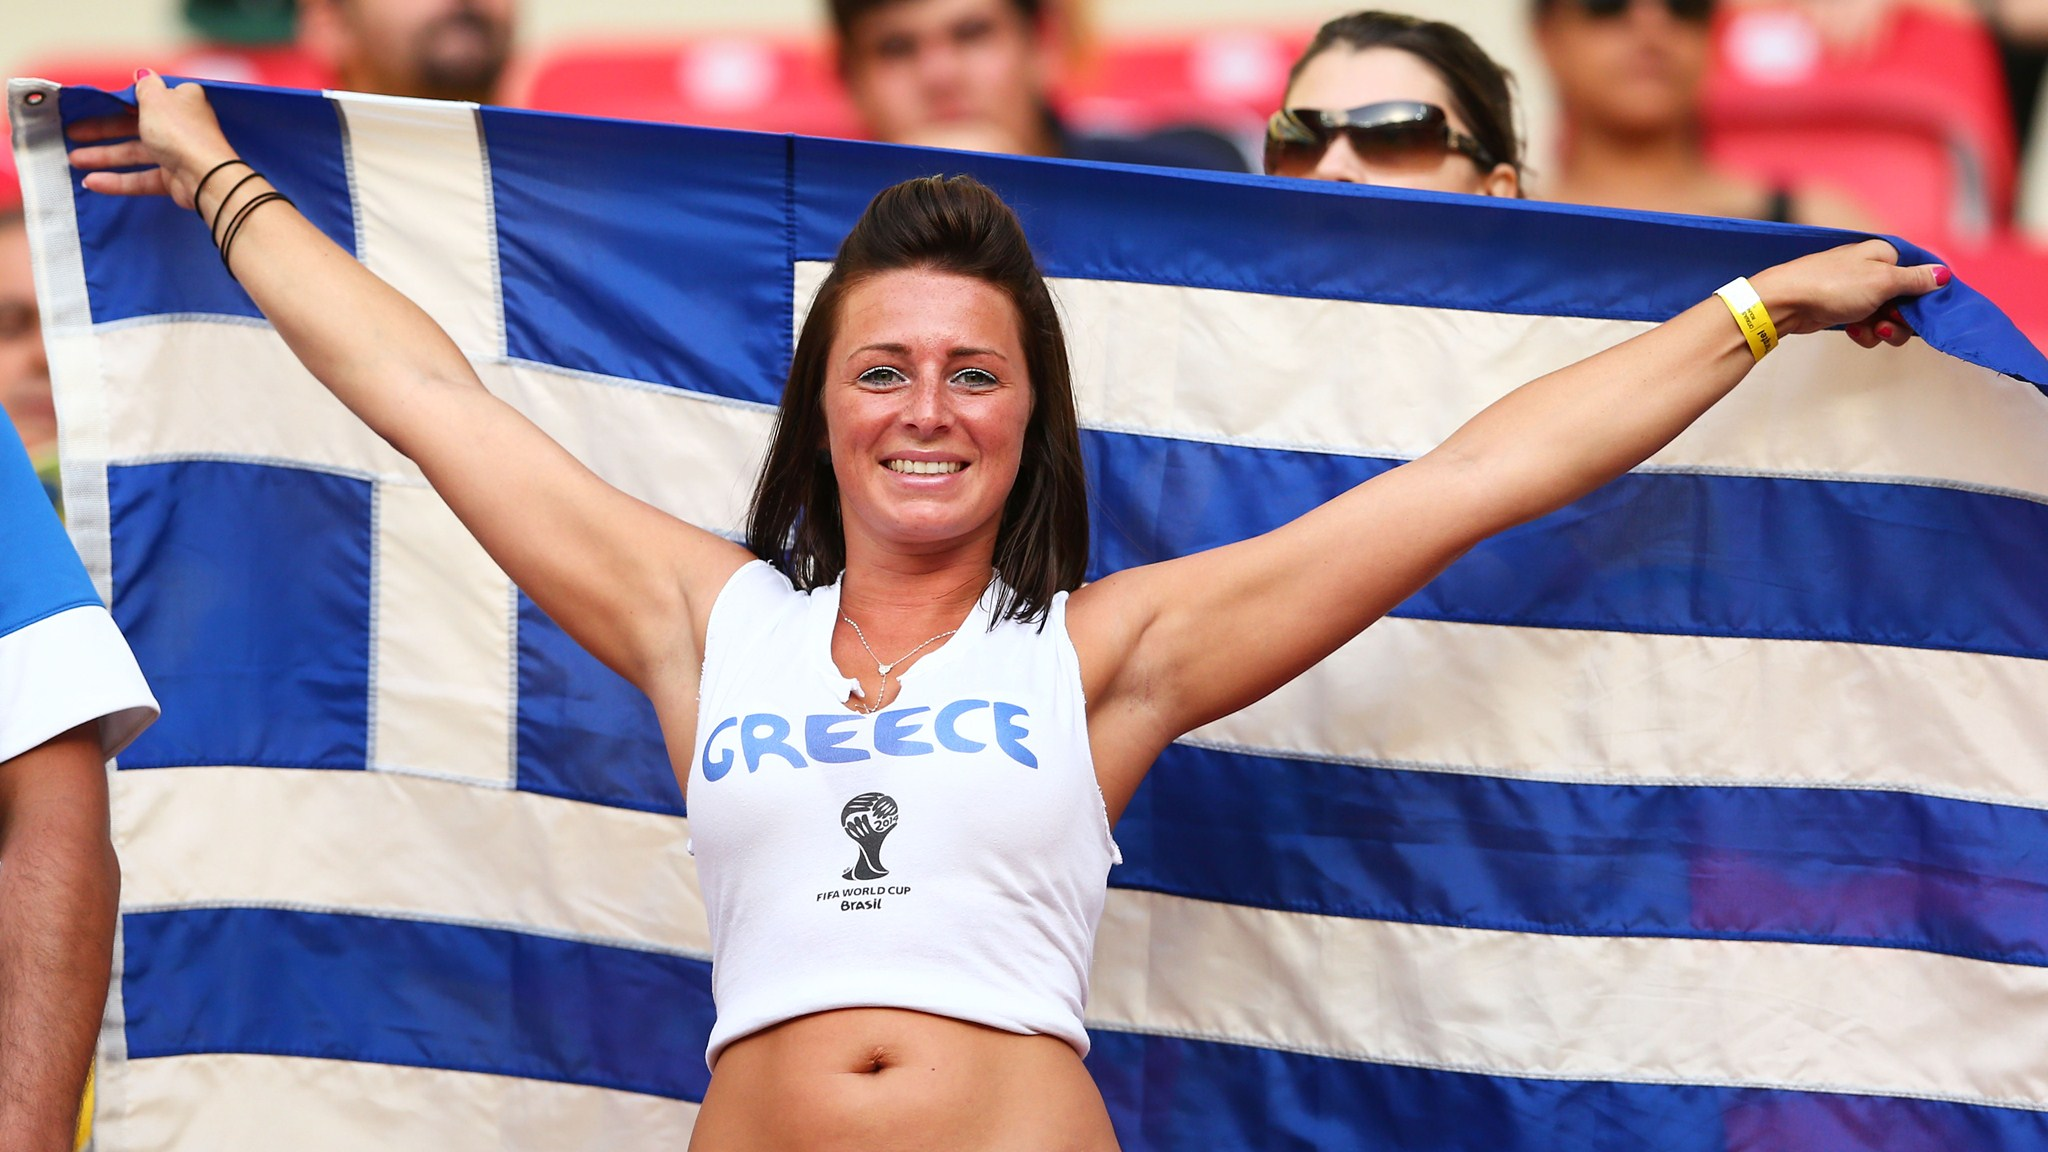 184 - Costa Rica-Greece [1-1 - Costa Rica win on penalties (5 - 3)] -- 29 Jun 2014 - 17-00